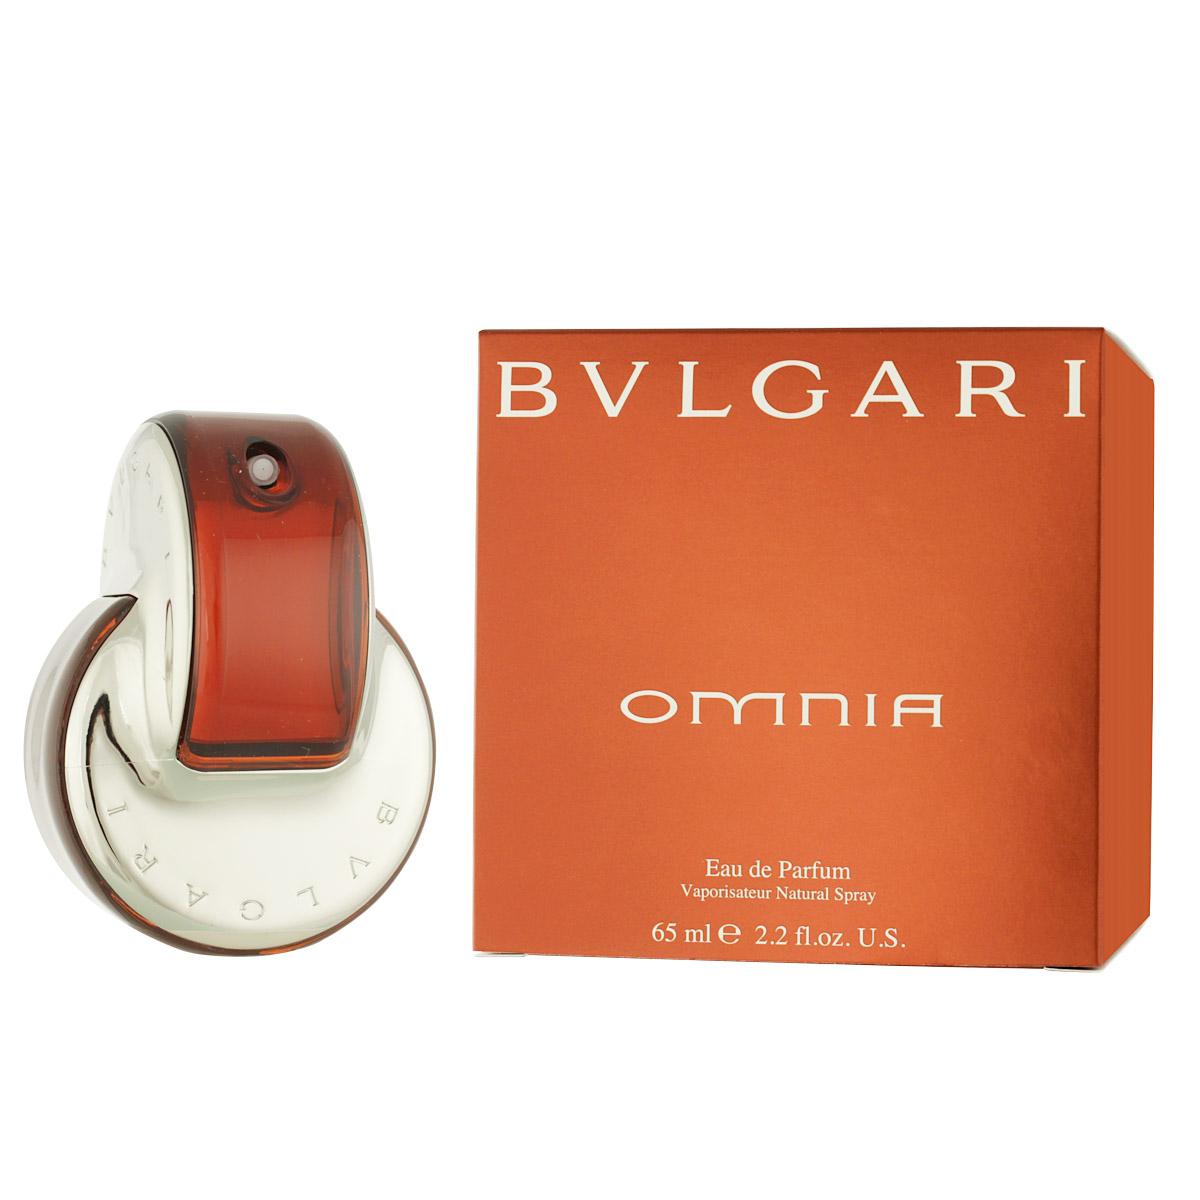 Bvlgari Omnia Eau De Parfum 65 ml (woman) 26393